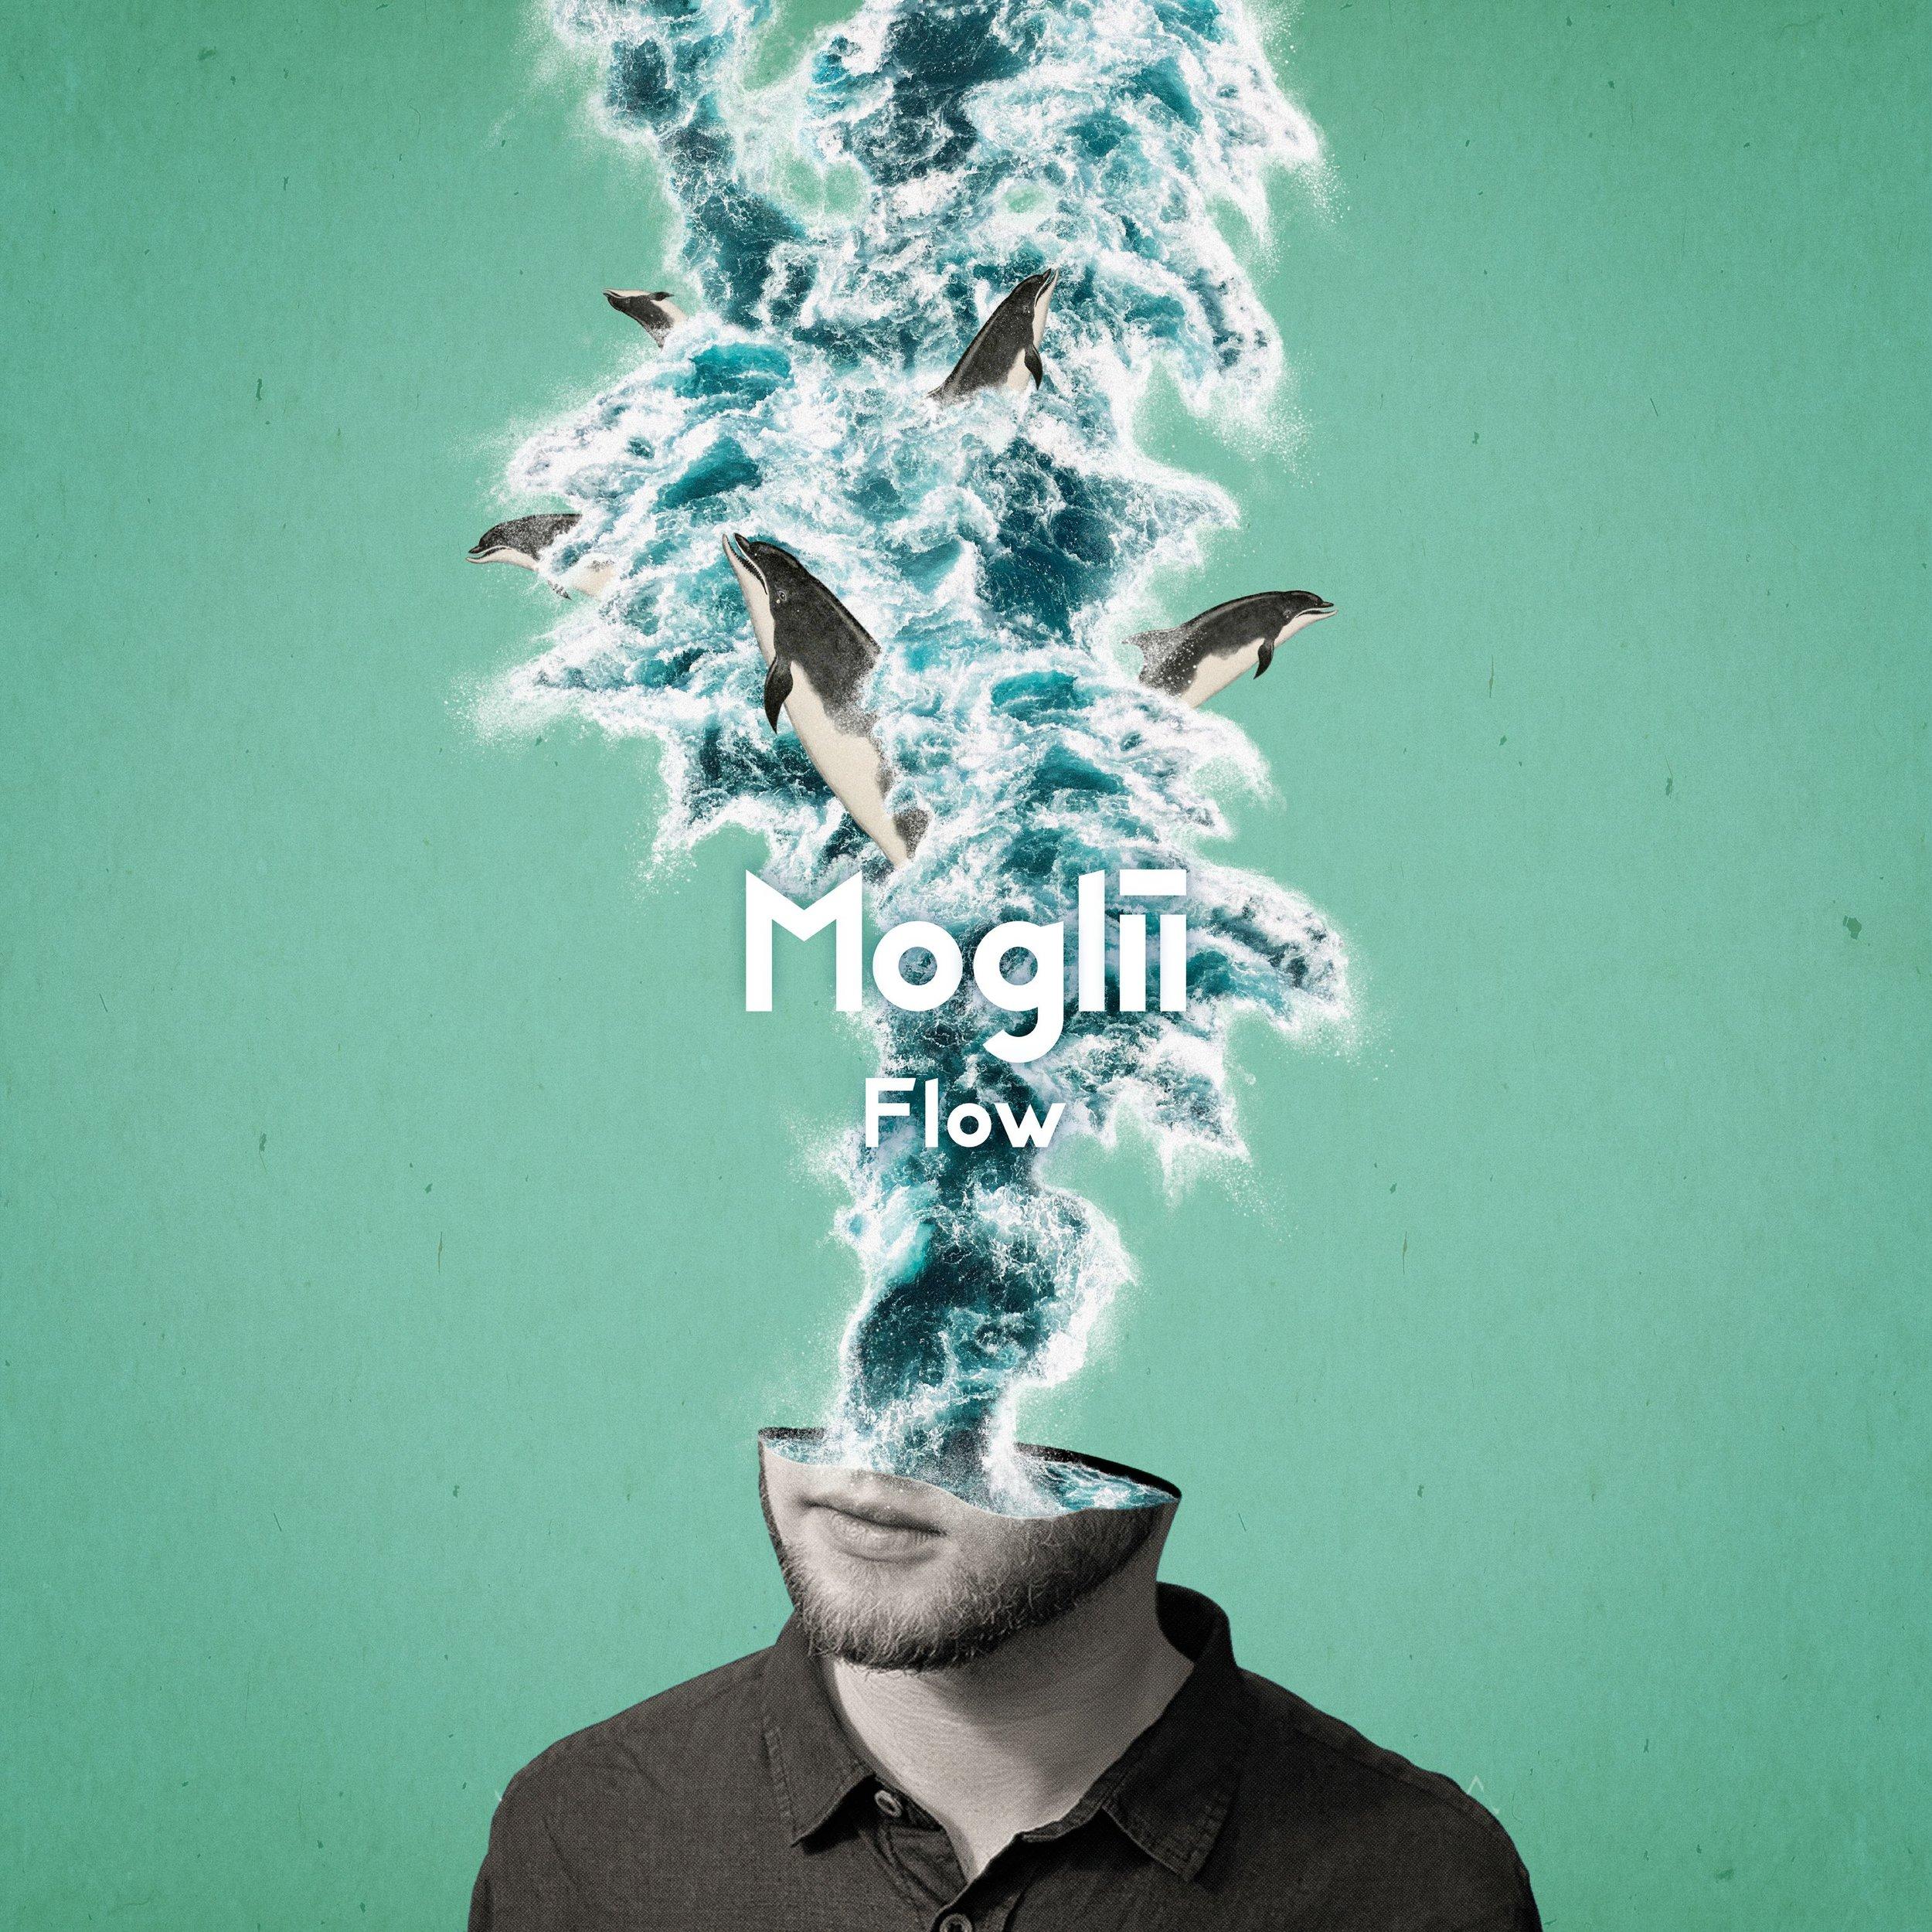 Moglii_Flow.jpg